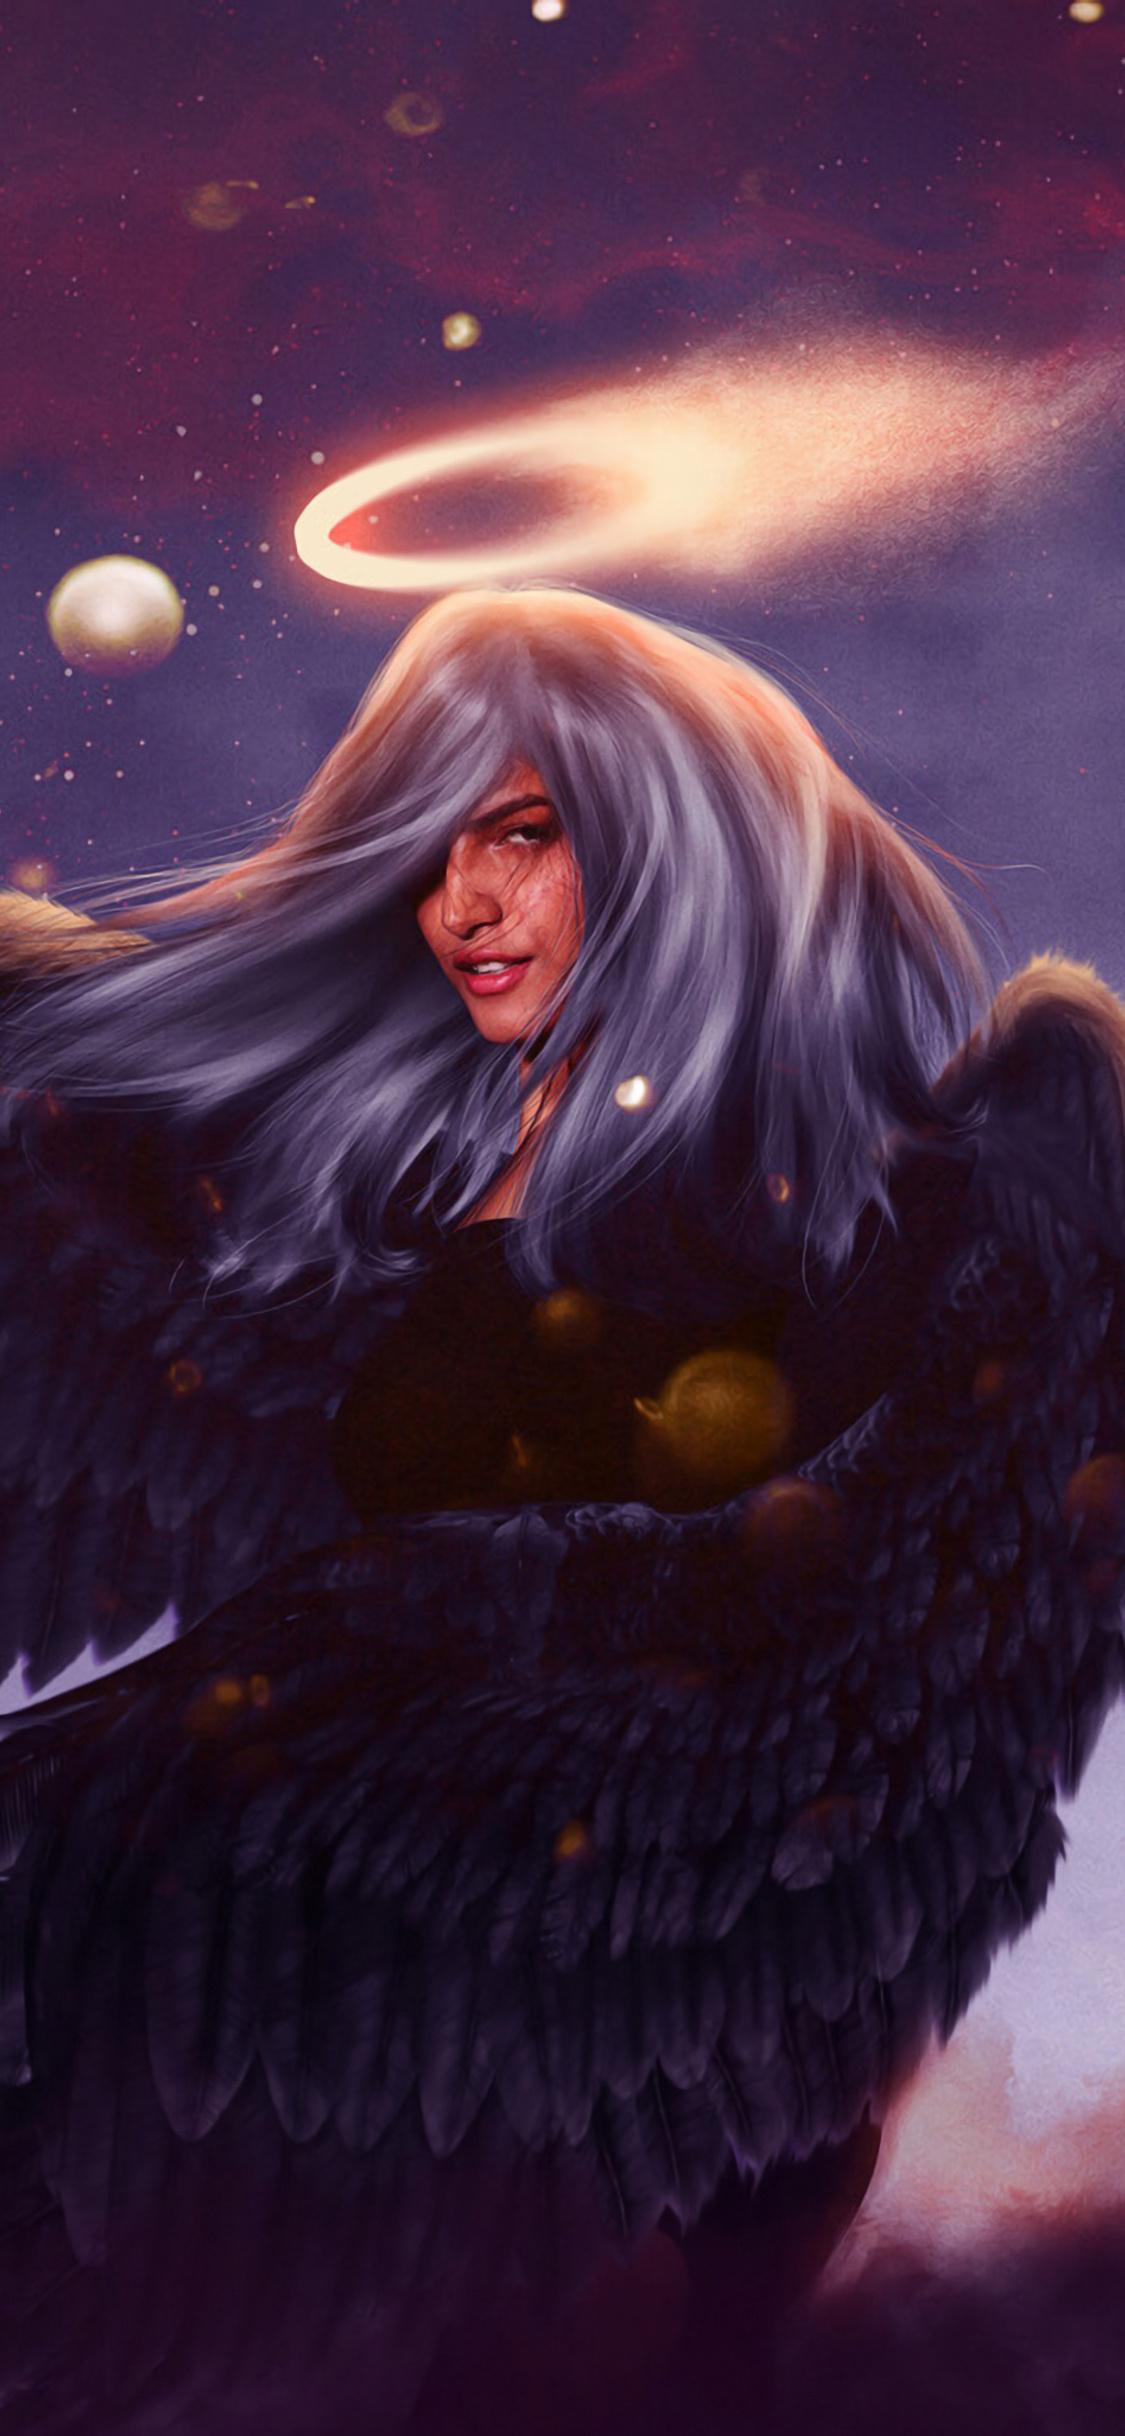 1125x2436 Angel Wings Fantasy Art 4k Iphone Xs Iphone 10